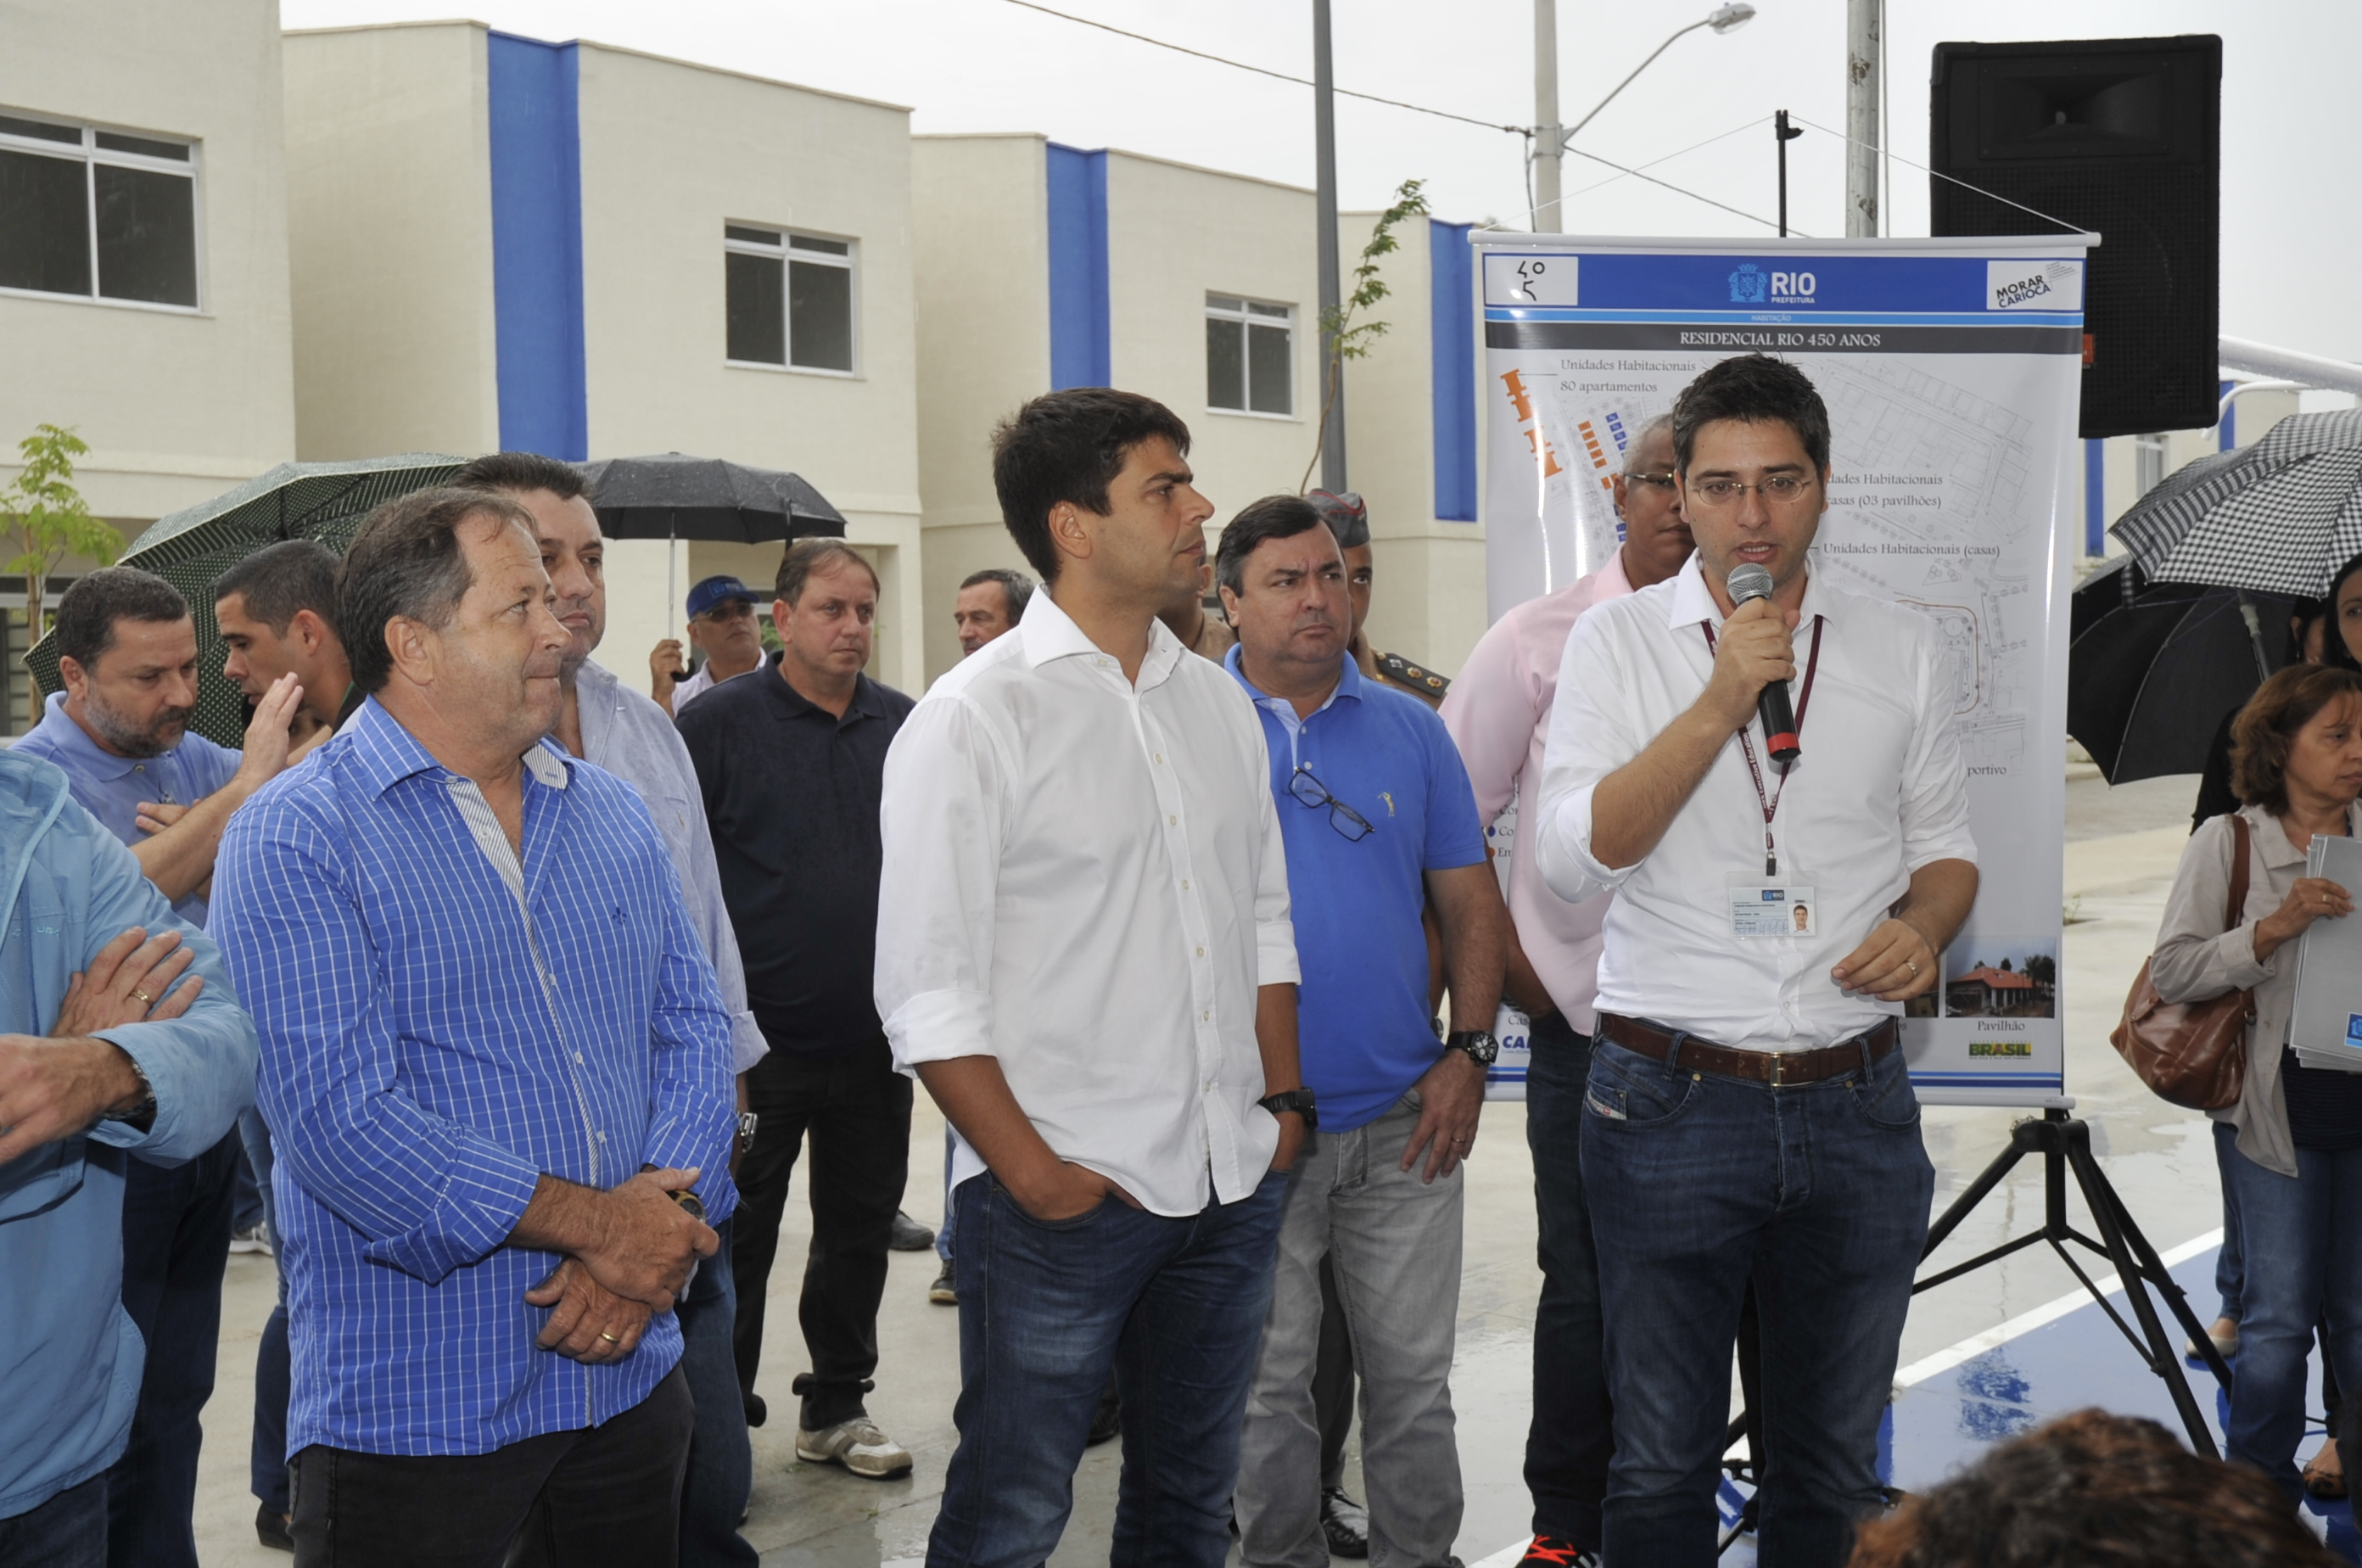 Prefeitura entrega casas do Programa Morar Carioca na Colônia Juliano Moreira